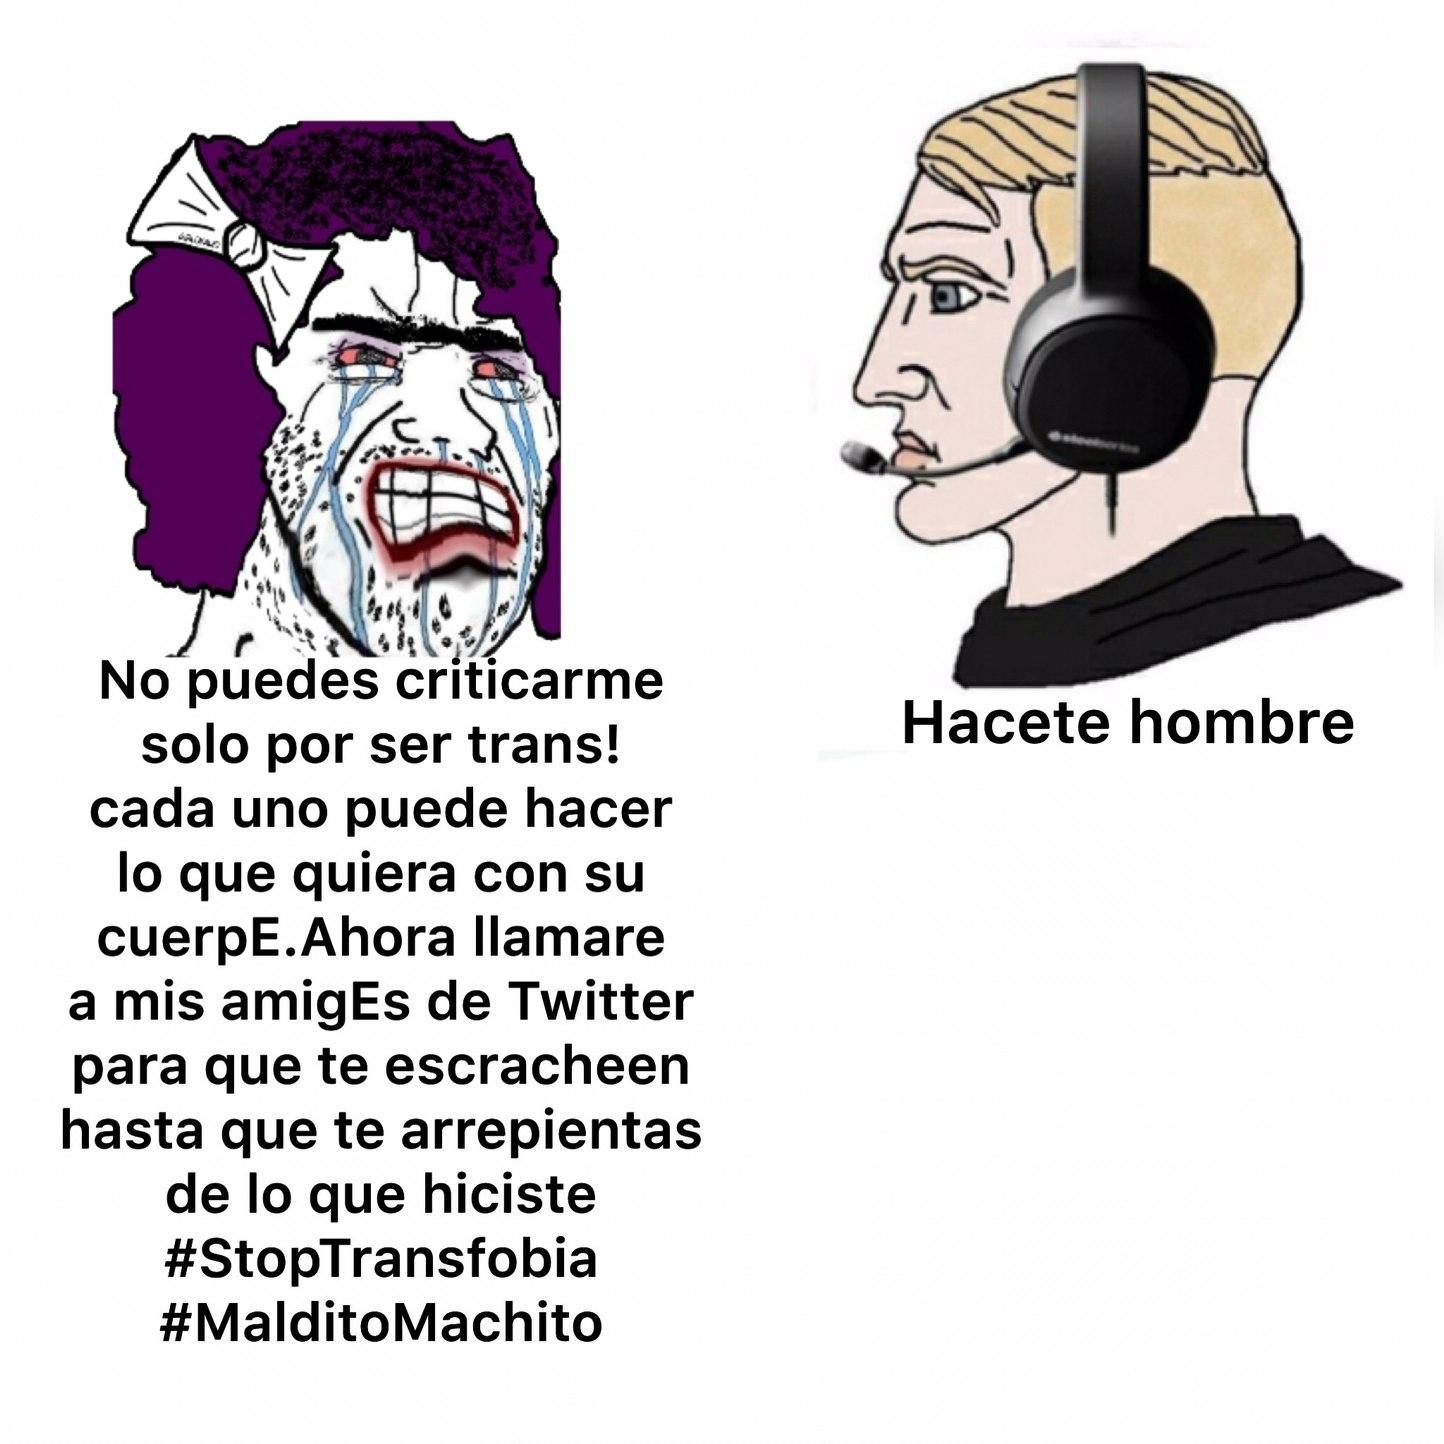 wojak trans wojak trans - meme